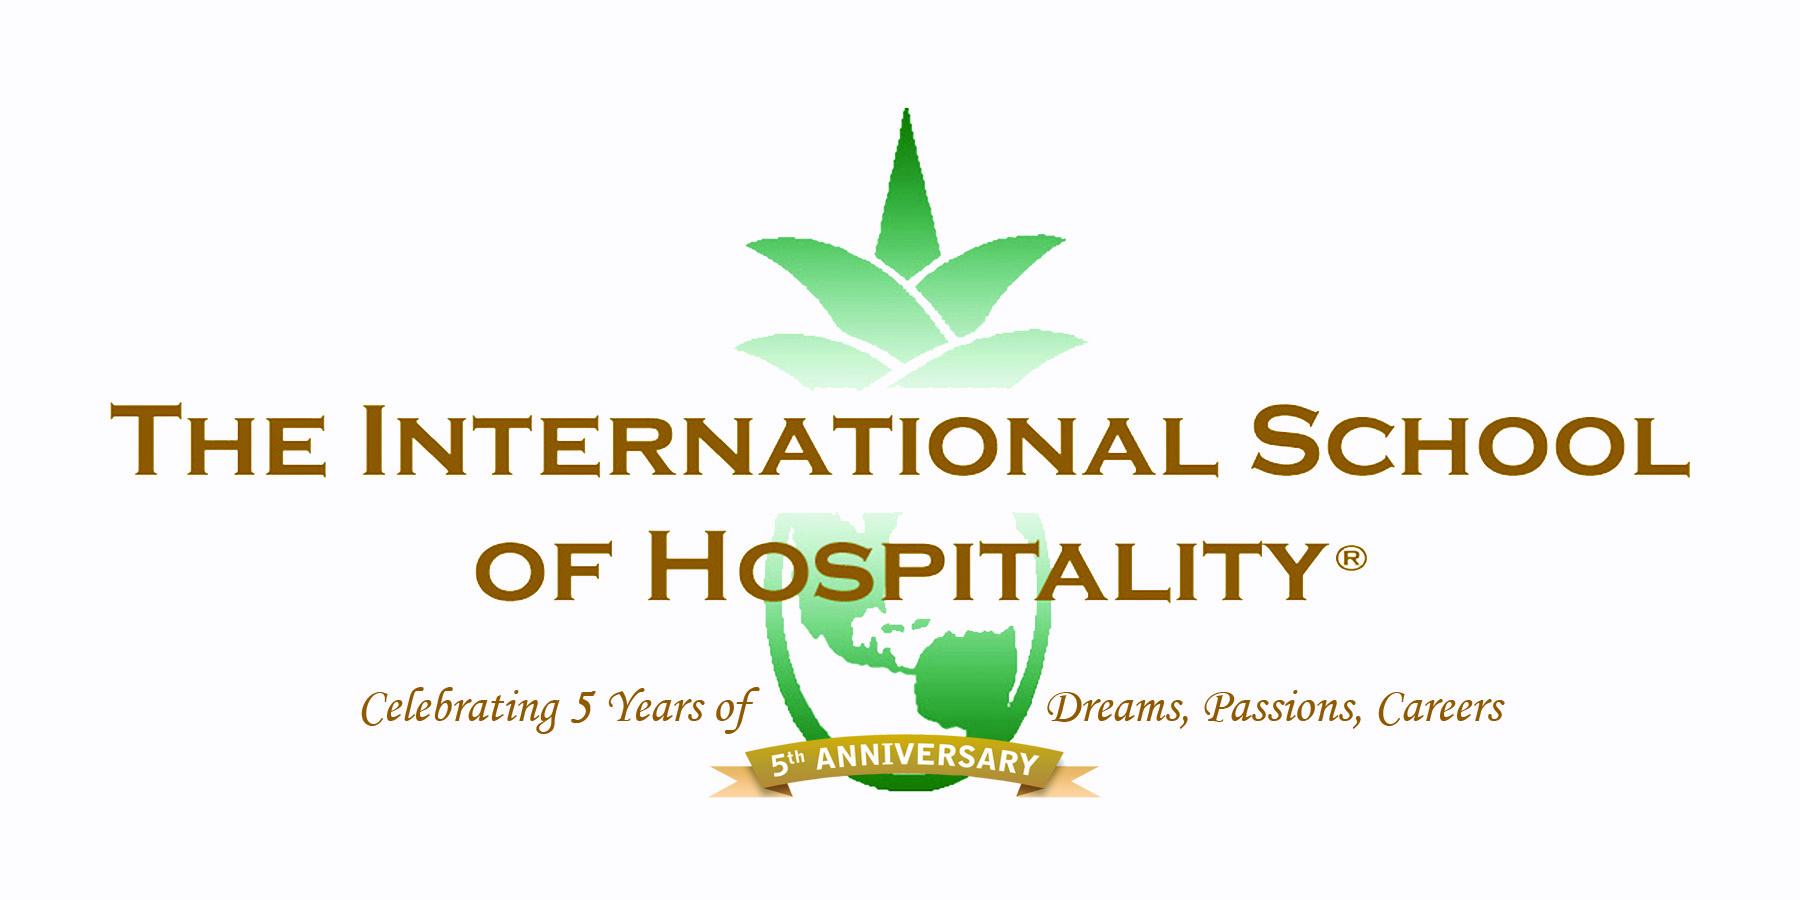 The International School Of Hospitality Announces November 2010